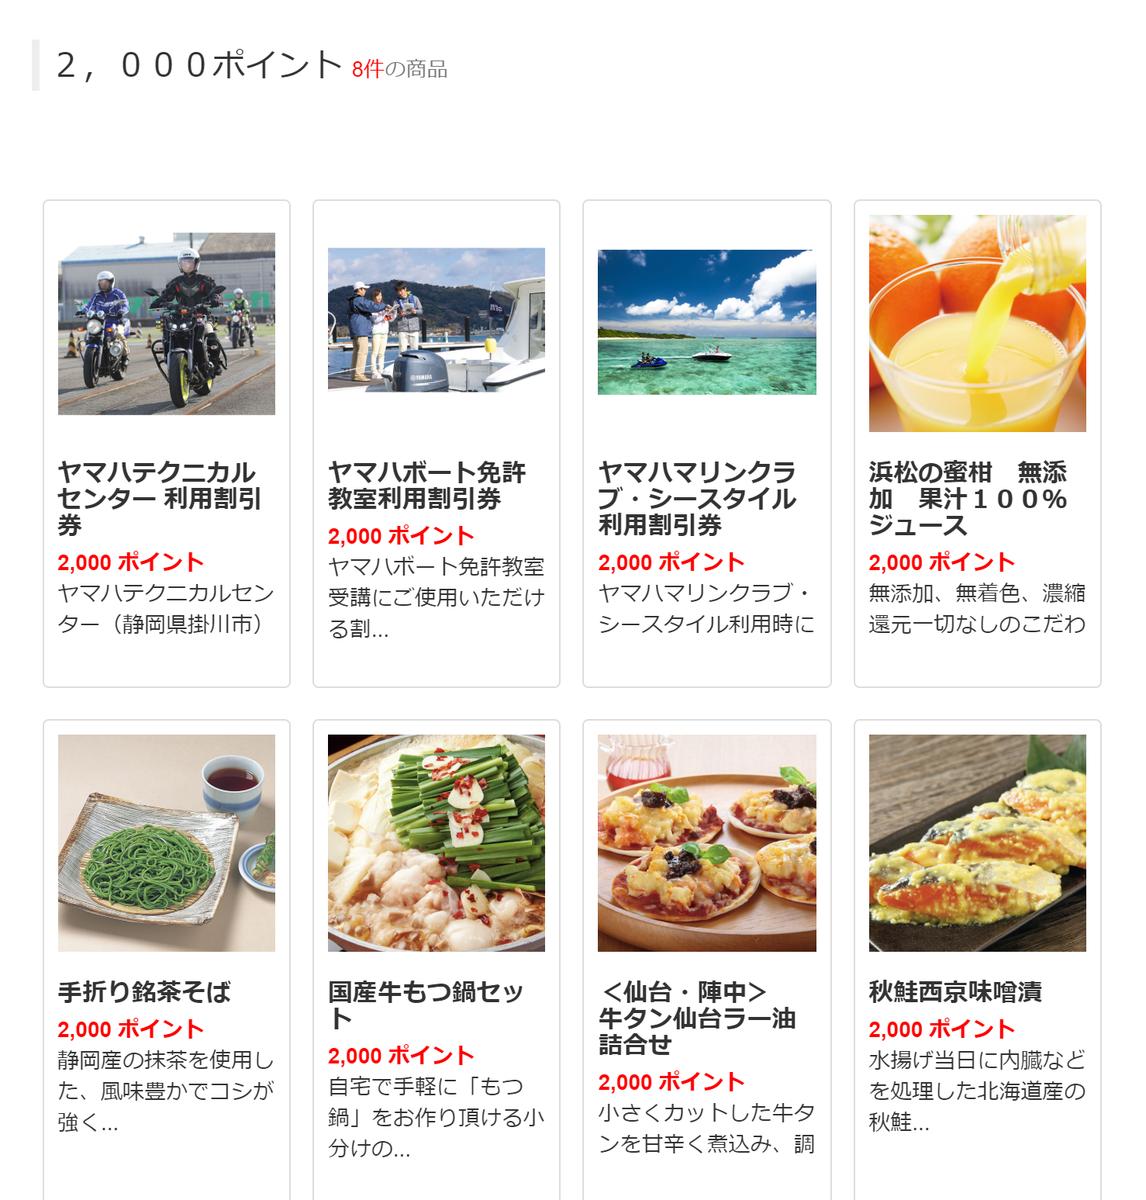 f:id:ushirotaro:20200306173359p:plain